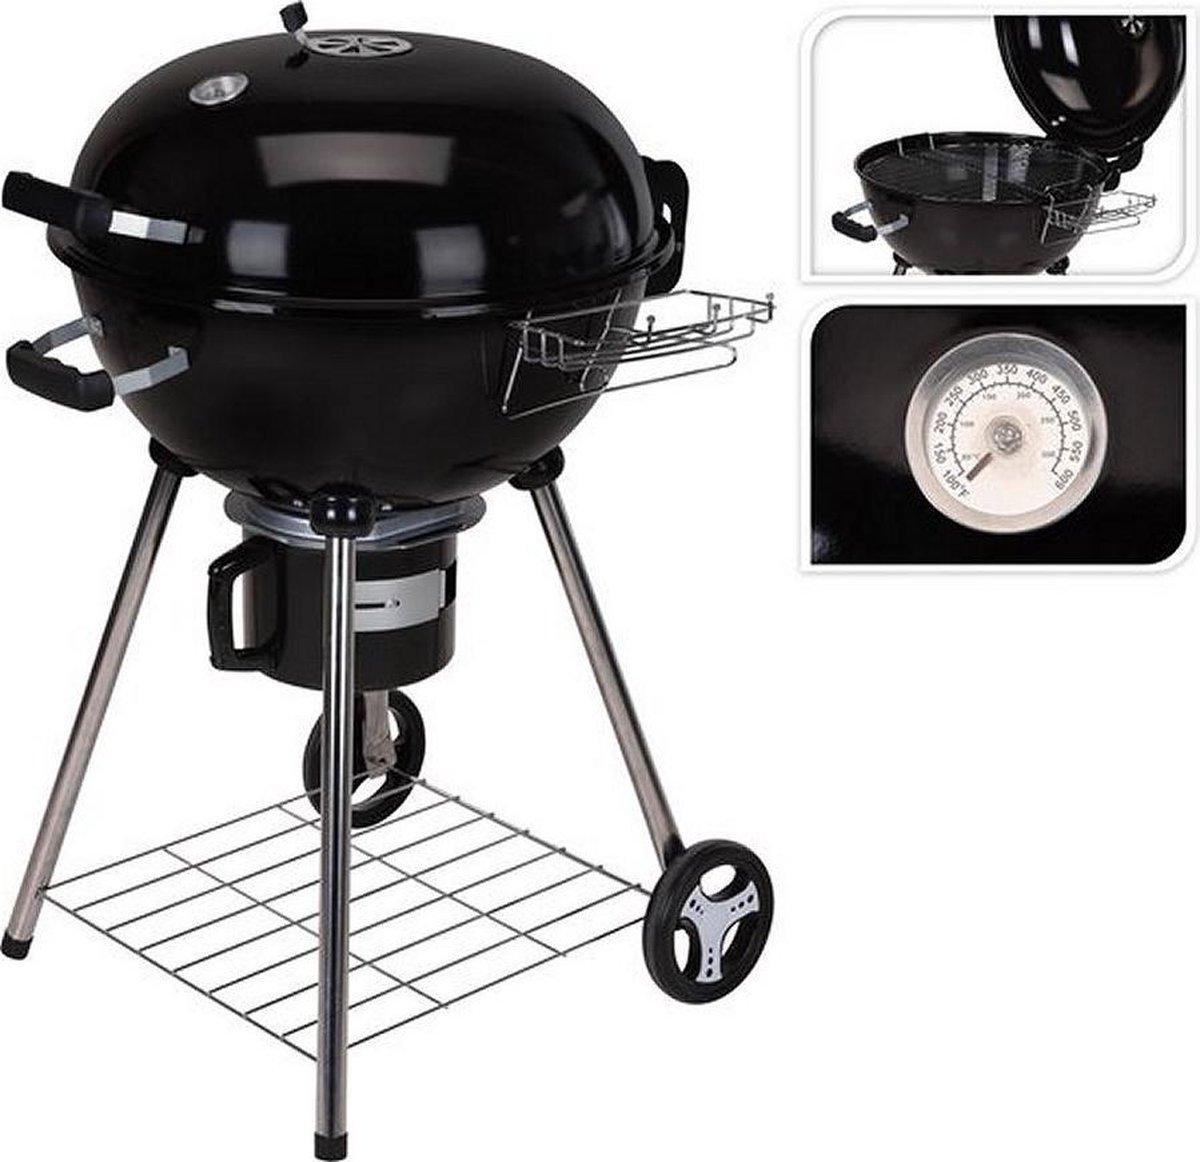 BBQ Houtskool Barbecue - Grilloppervlak 44 x 32 cm | Zwart